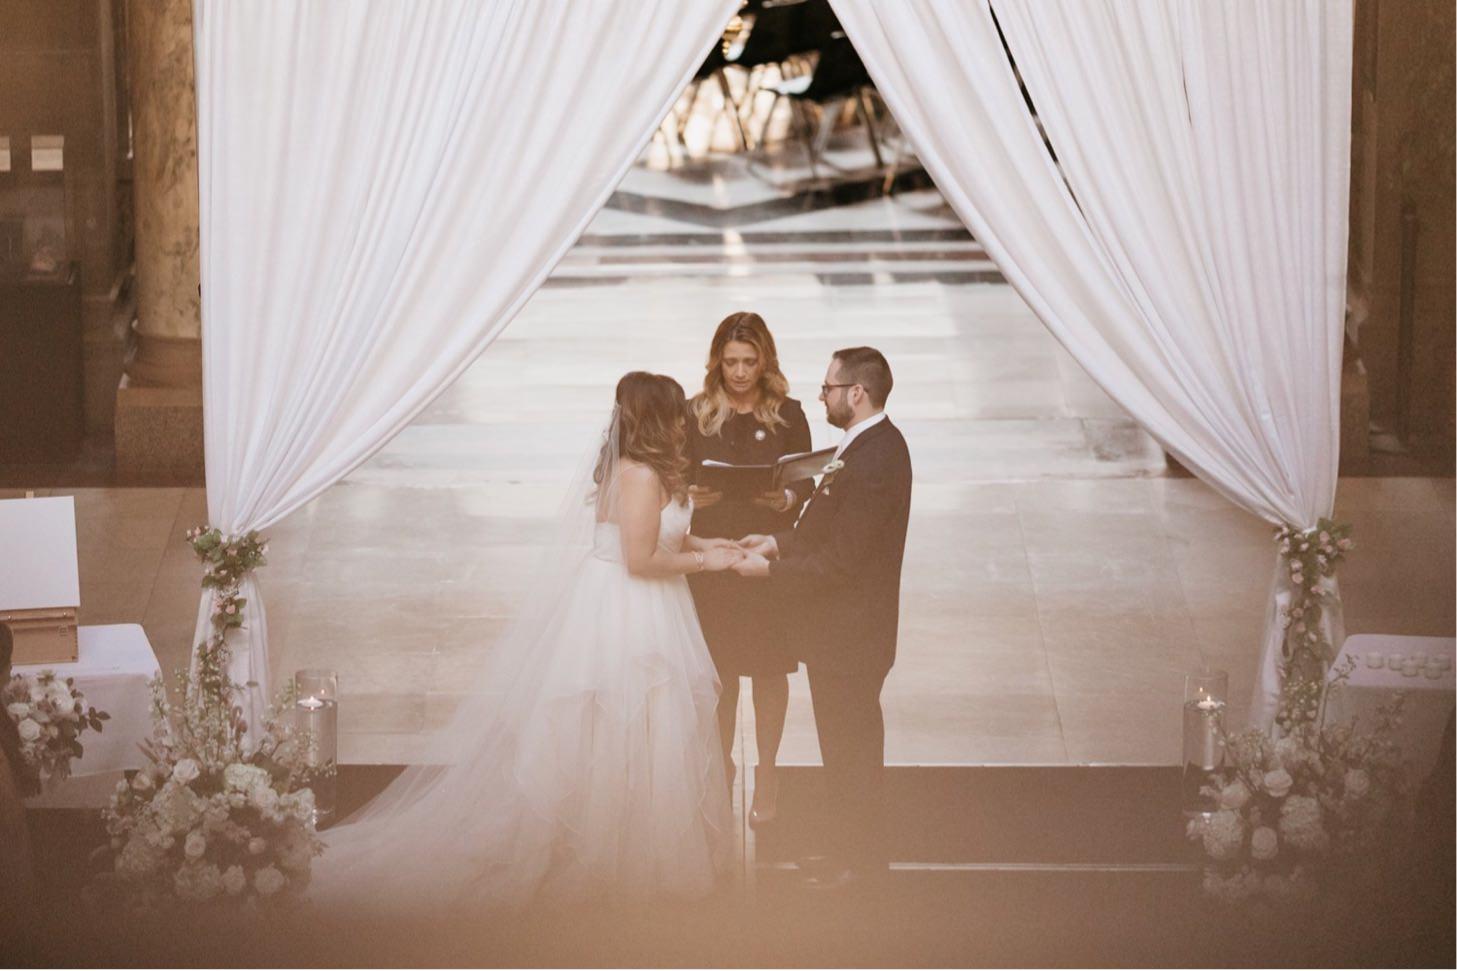 indiana-state-house-wedding-downtown-indianapolis-wedding-photographer036.JPG